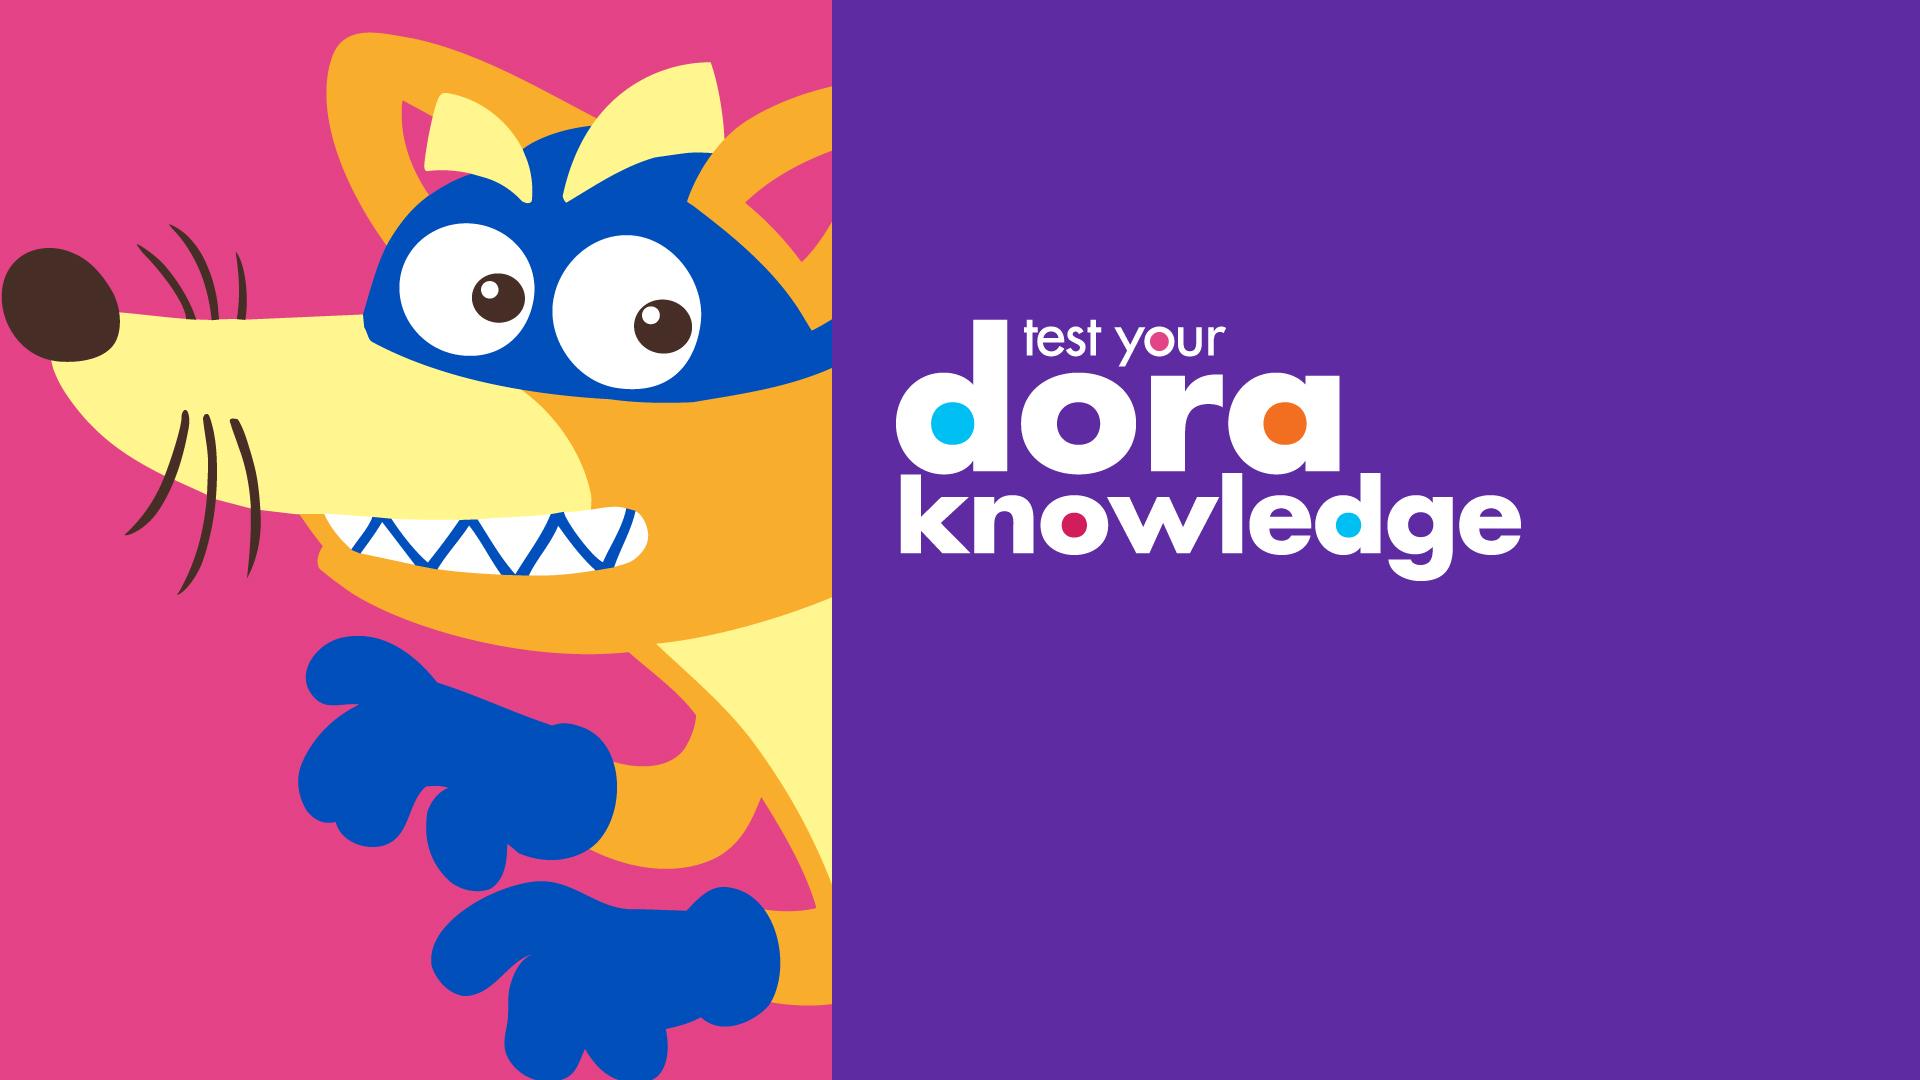 SuperFanSunday_DORA_Swiper_knowledge.jpg